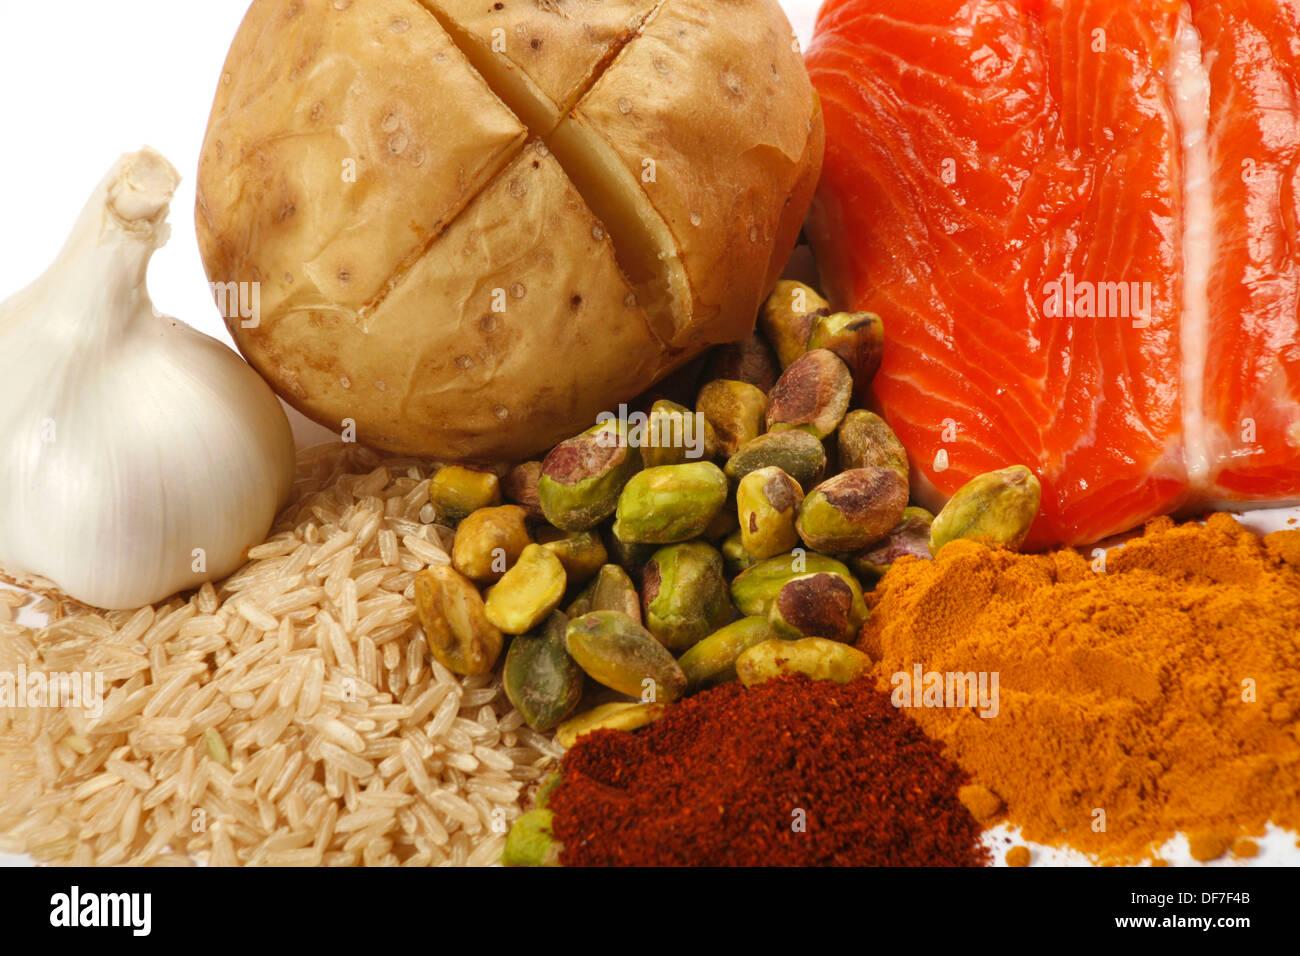 Vitamin B6 Stock Photos & Vitamin B6 Stock Images - Alamy